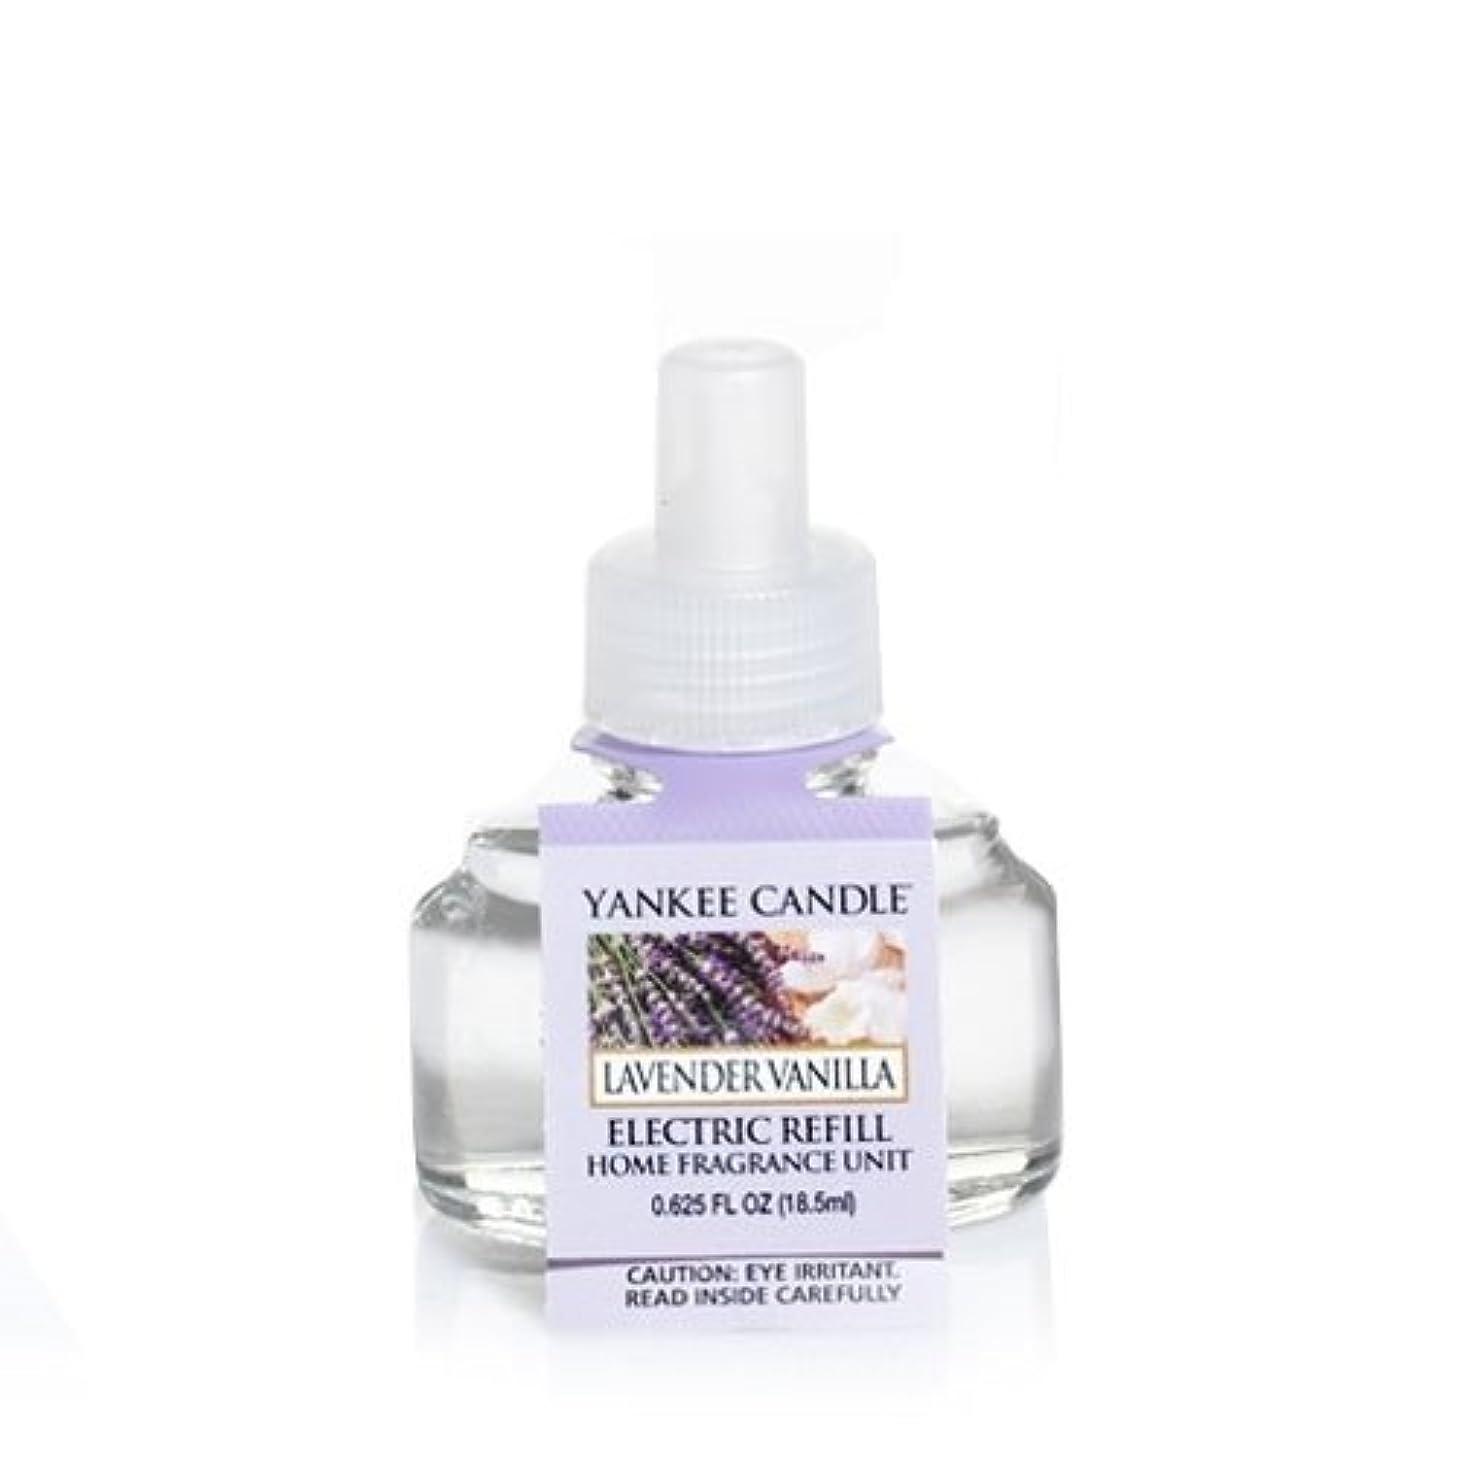 Yankee Candle Lavender Vanilla ScentPlug Refill rlbmcaxus